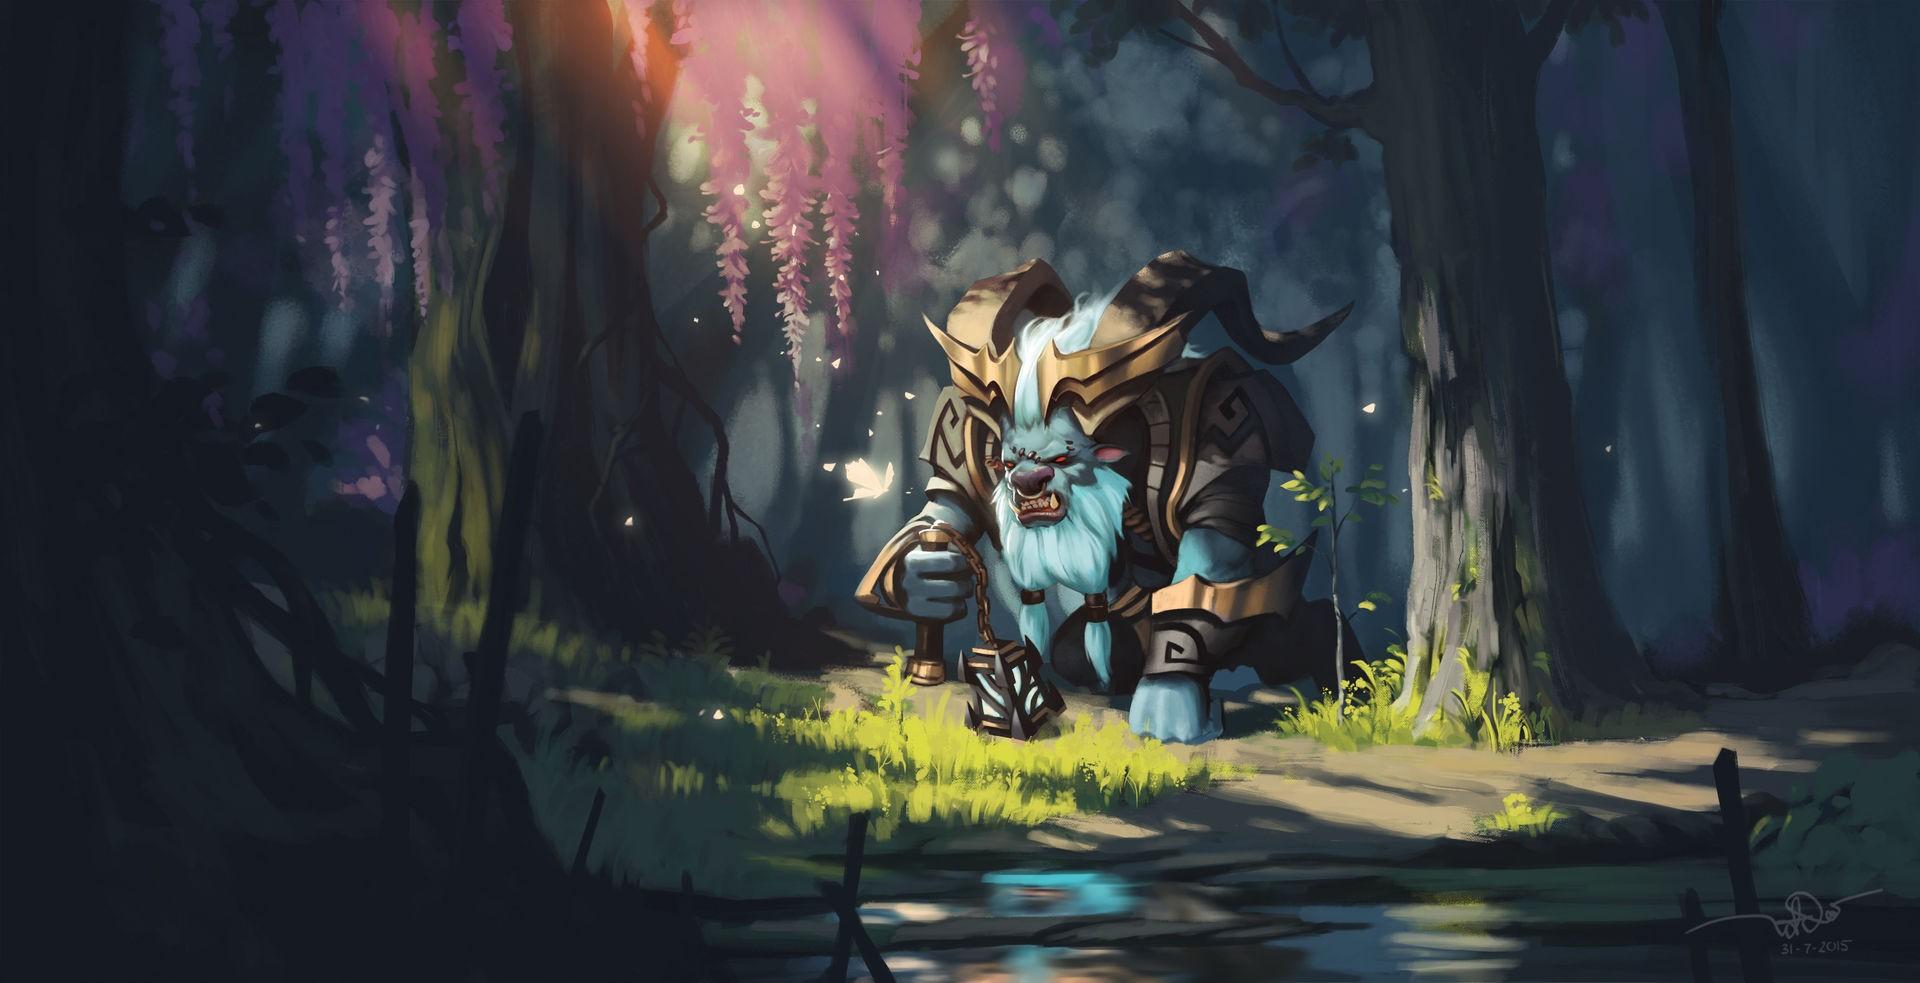 Wallpaper Anime Dota 2 Defense Of The Ancients Valve